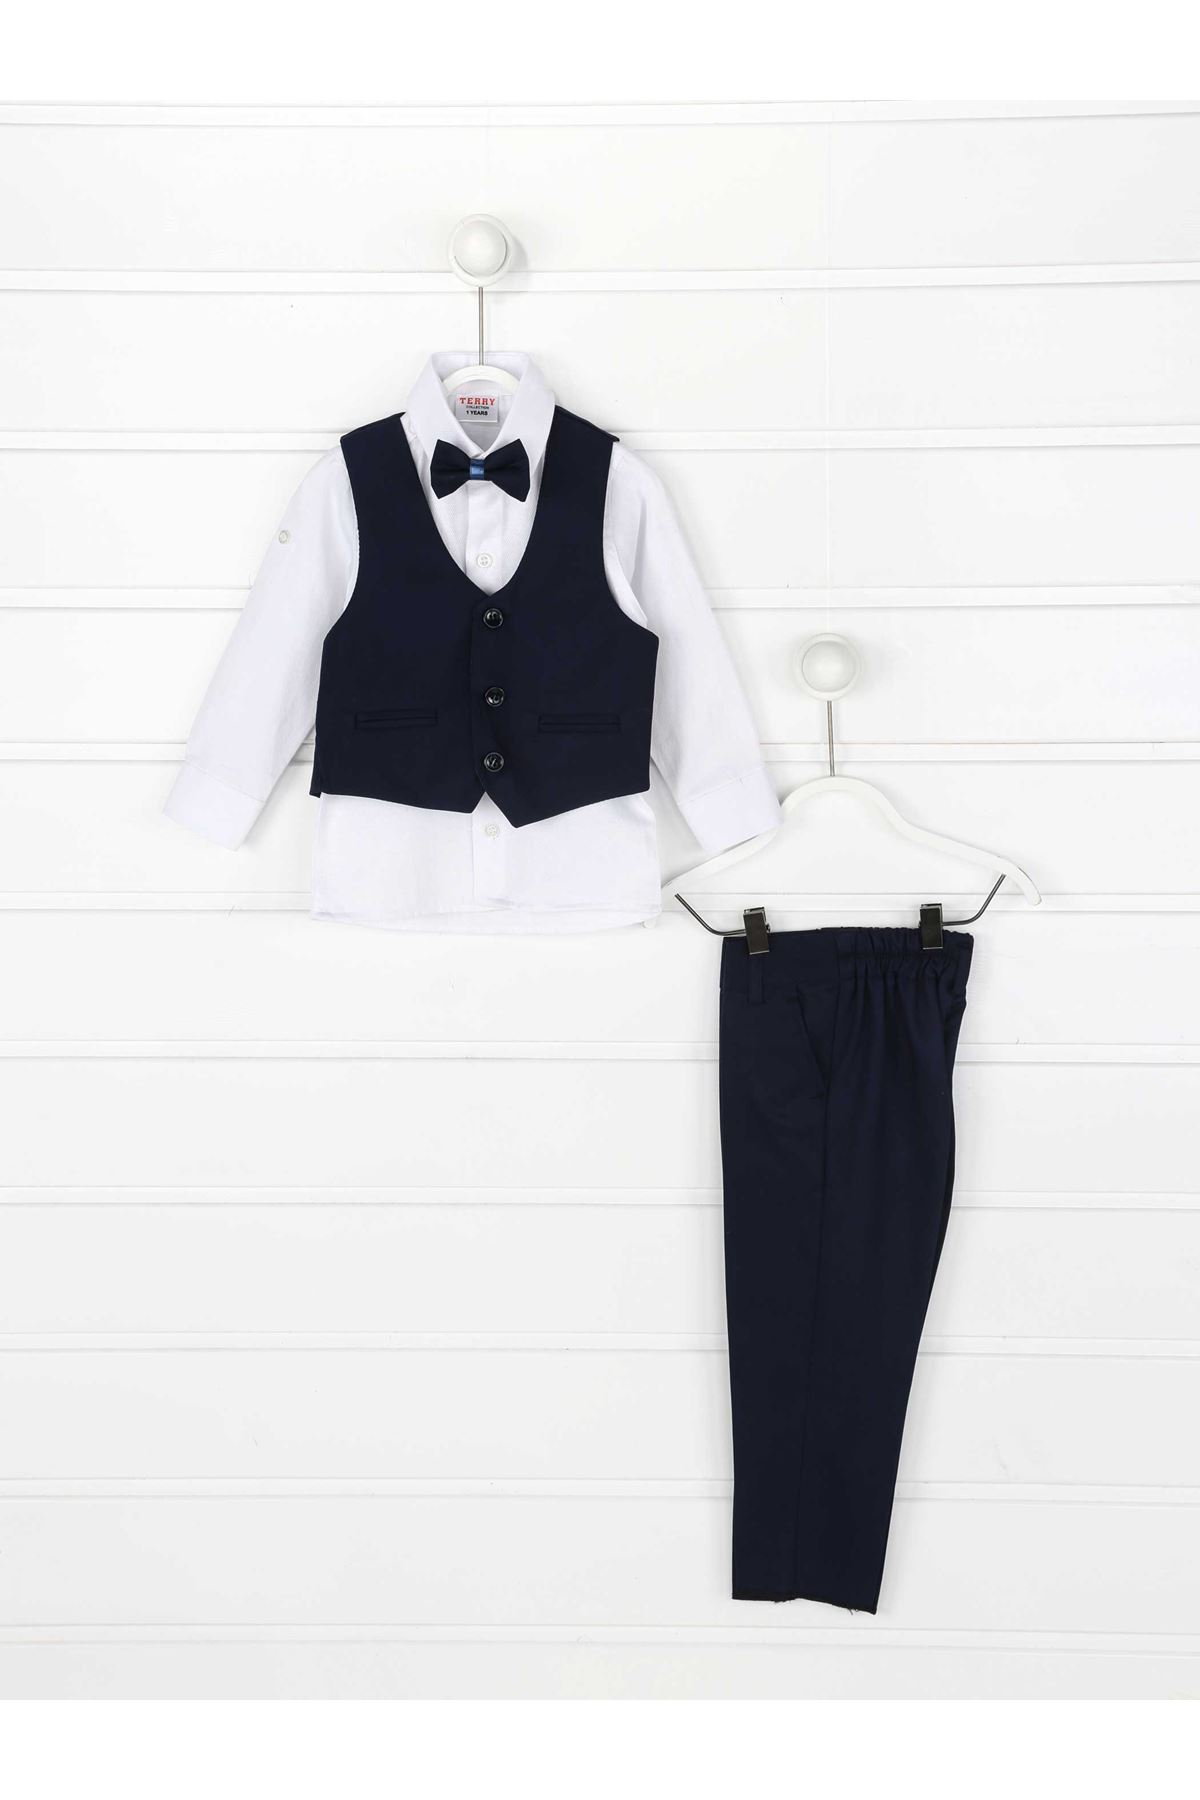 Navy blue Vest Papyonlu Male Child Suit